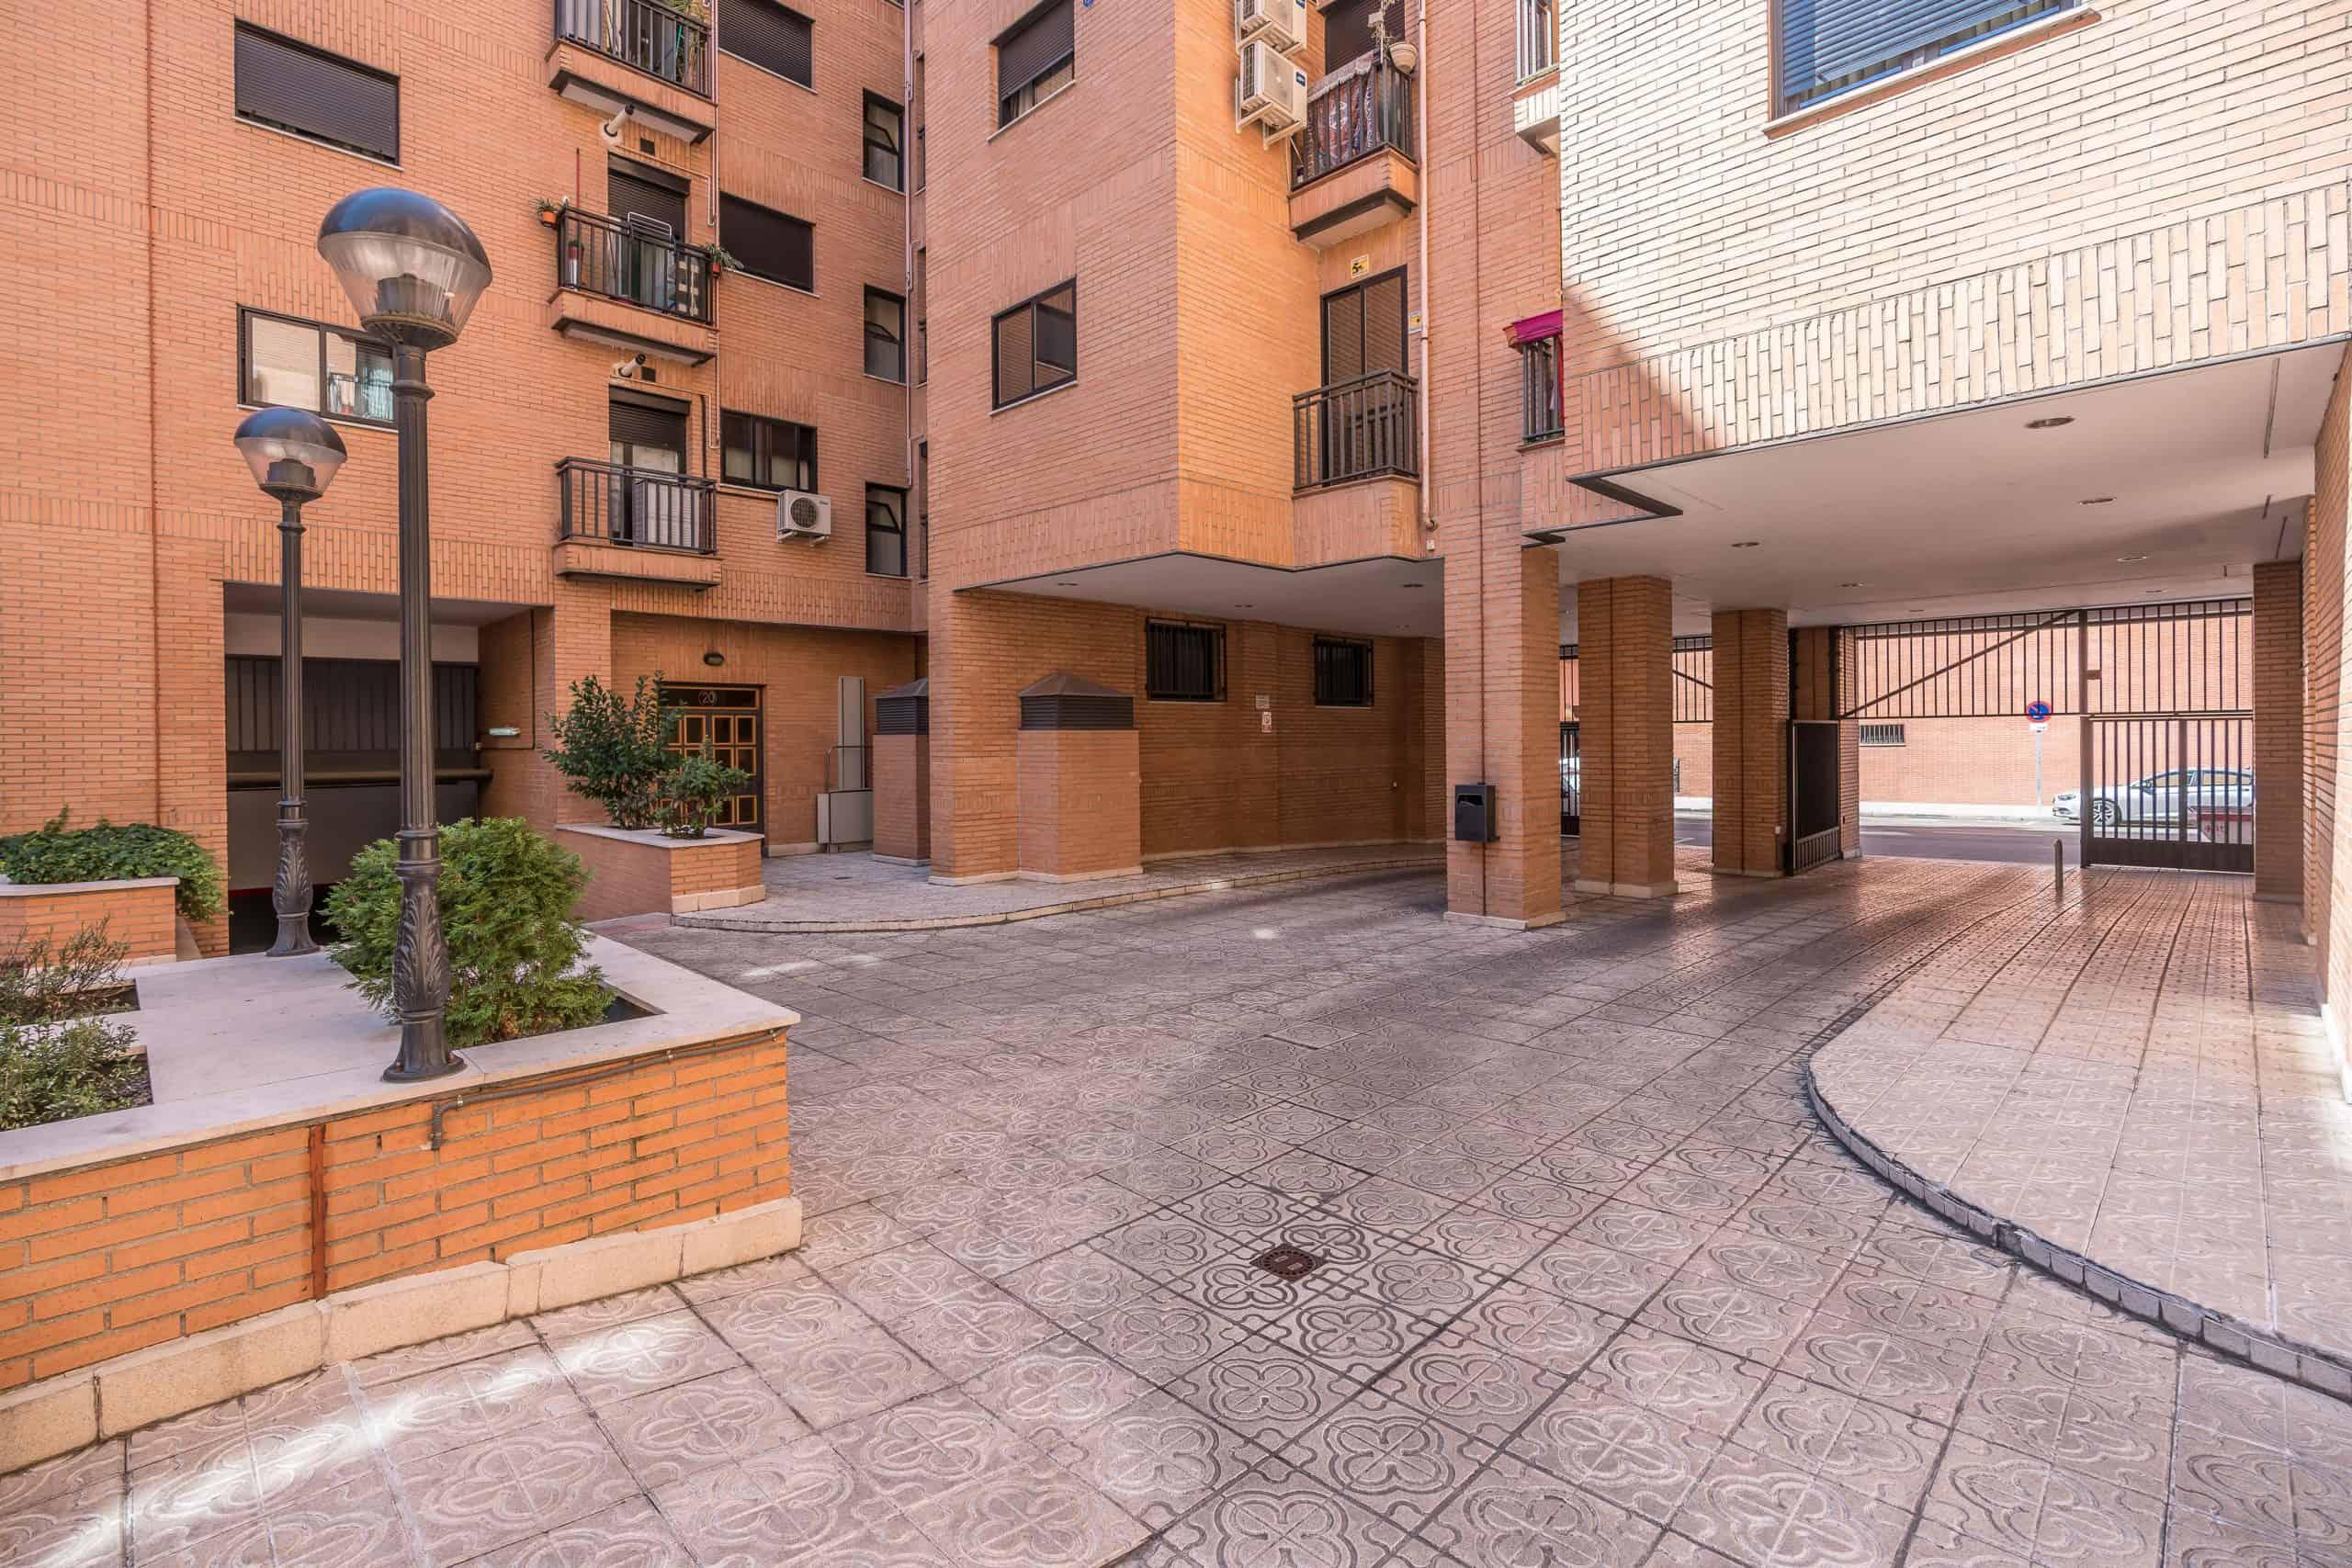 Agencia Inmobiliaria de Madrid-FUTUROCASA-Zona ARGANZUELA-EMBAJADORES-LEGAZPI13 ZONAS COMUNES (2)